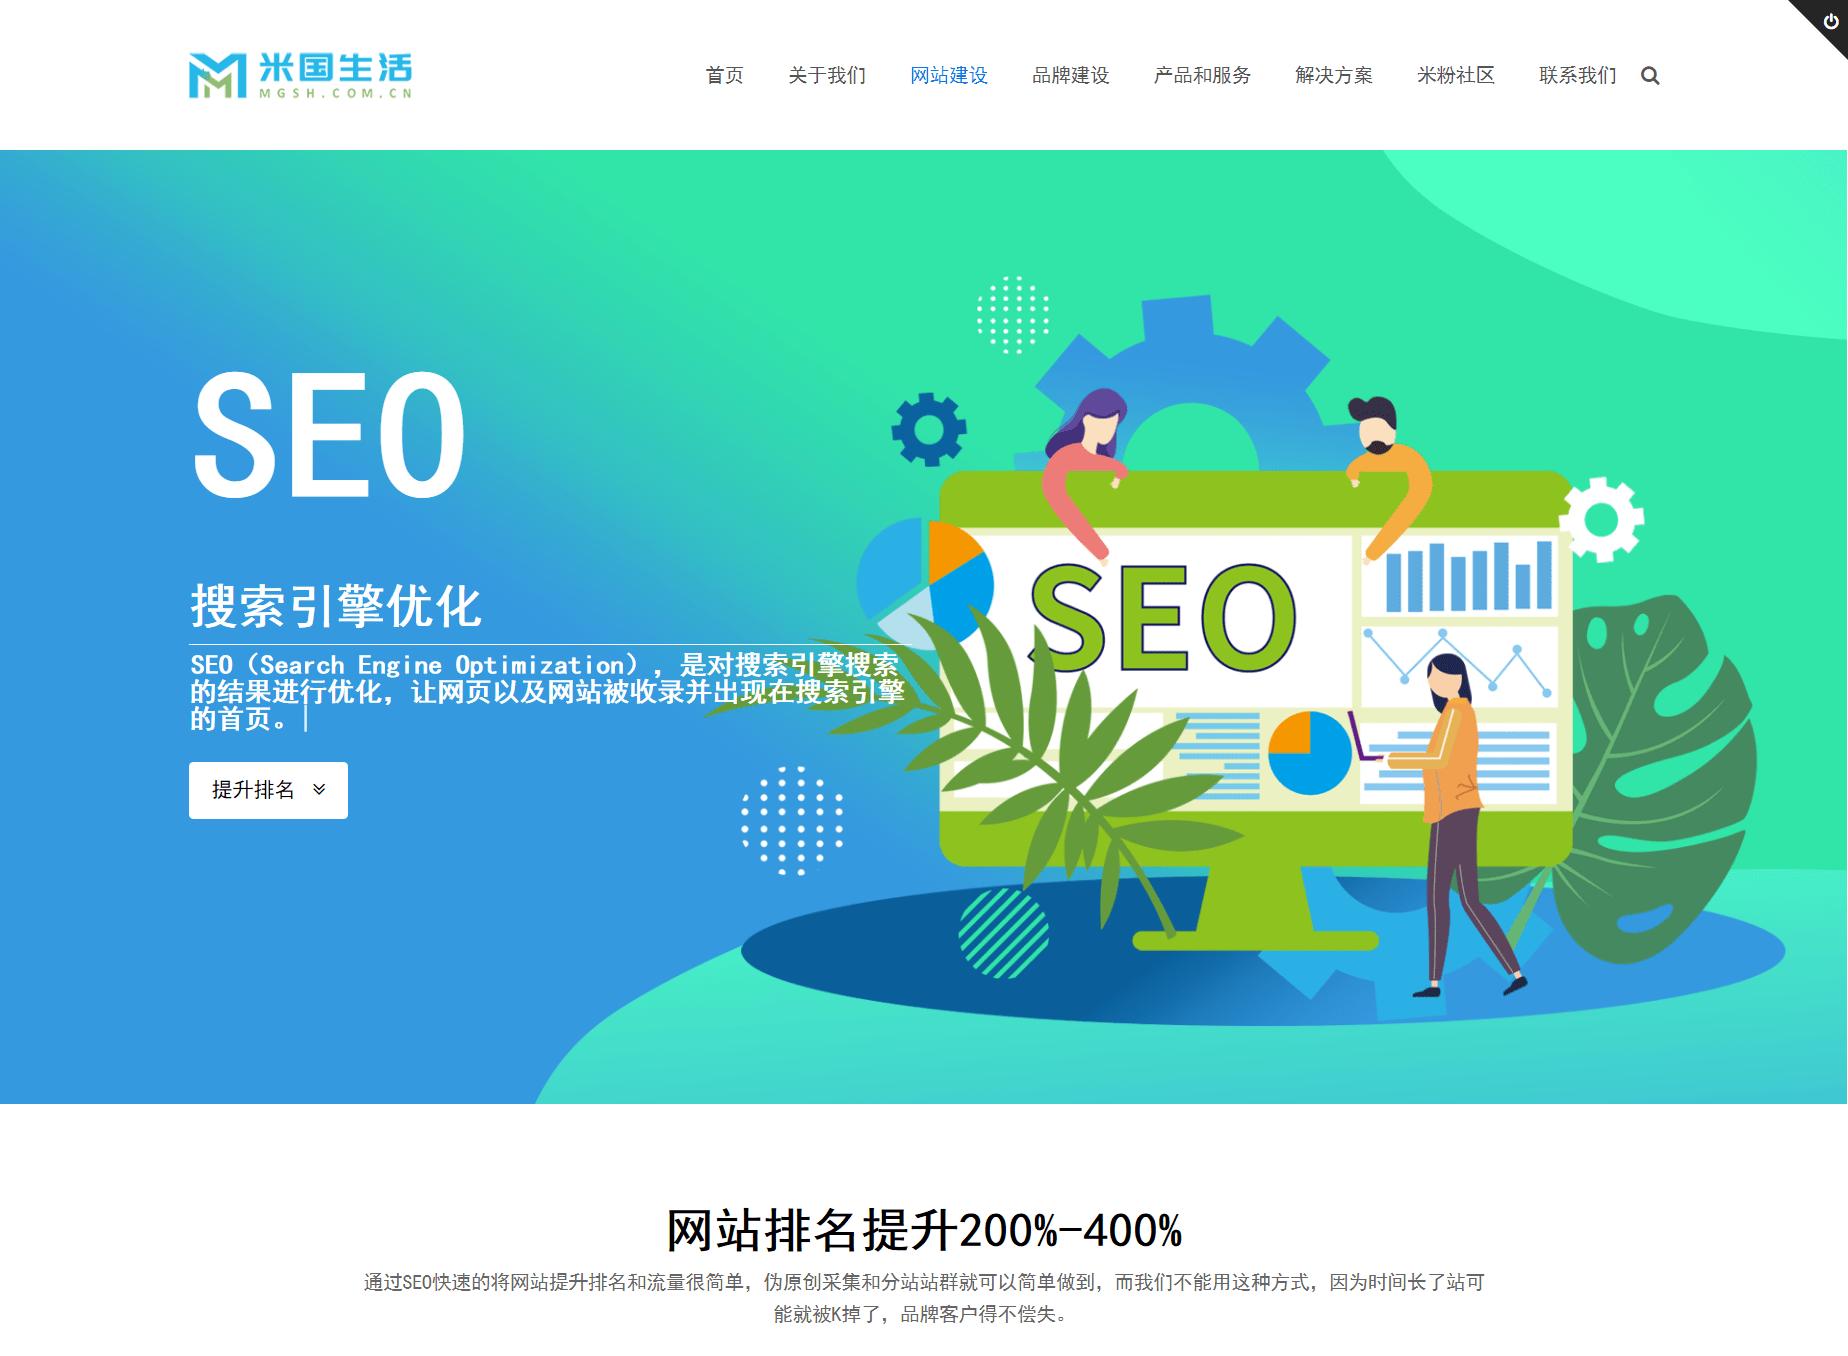 SEO-网站建设-网站优化-关键词优化